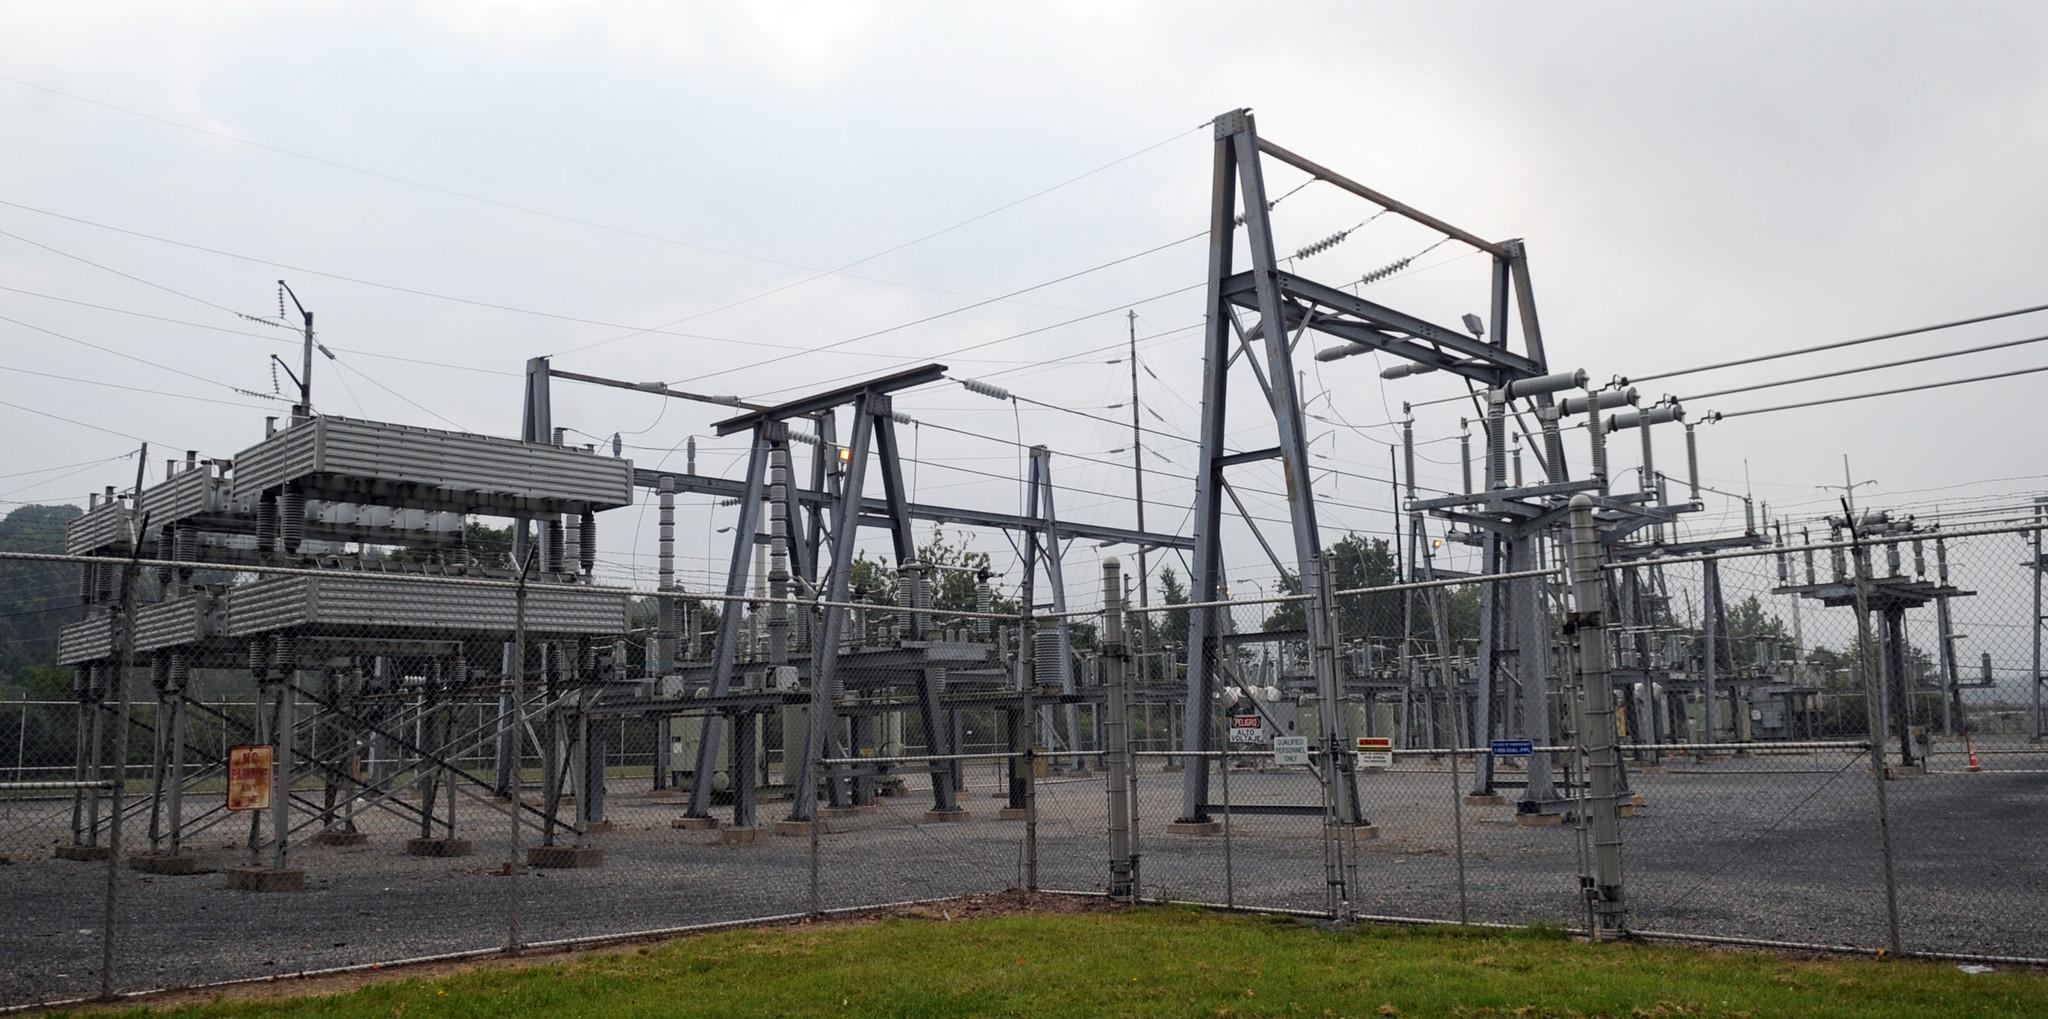 ppl plans massive electrical substation to power niz development